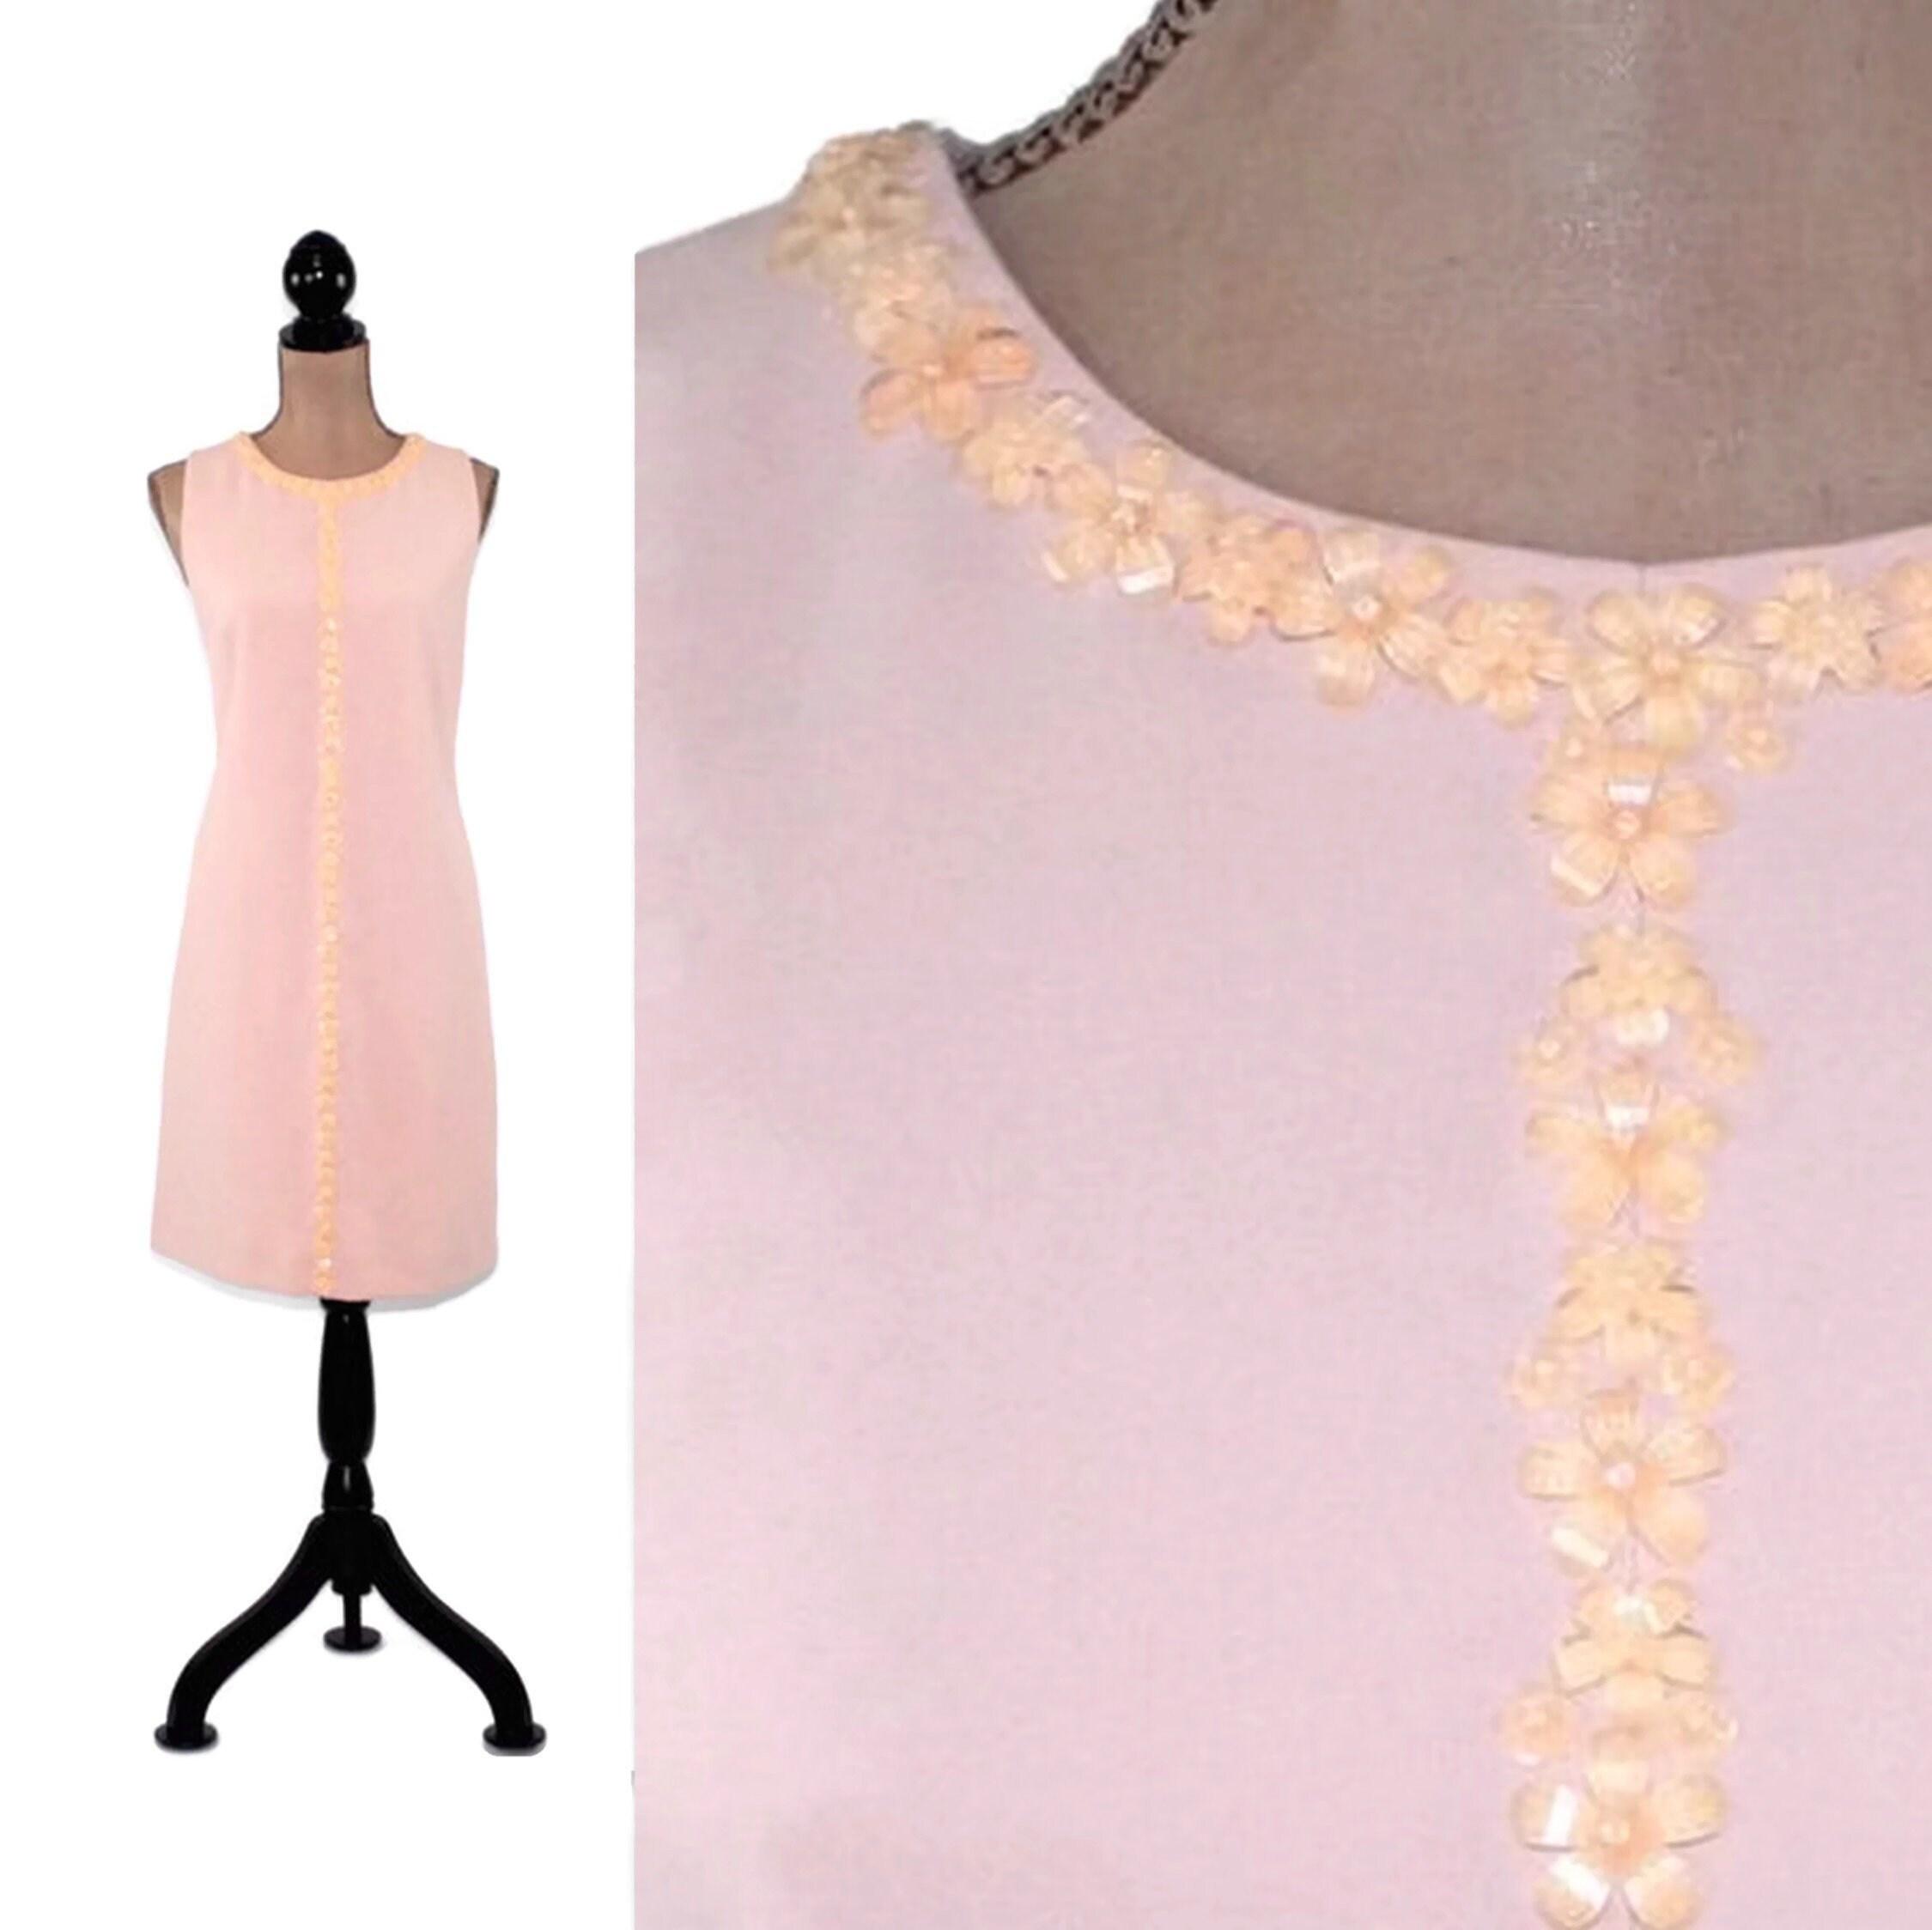 081541199b95 Sleeveless Dress Women Size 6 Tahari Midi Blush Pink Beige | Etsy